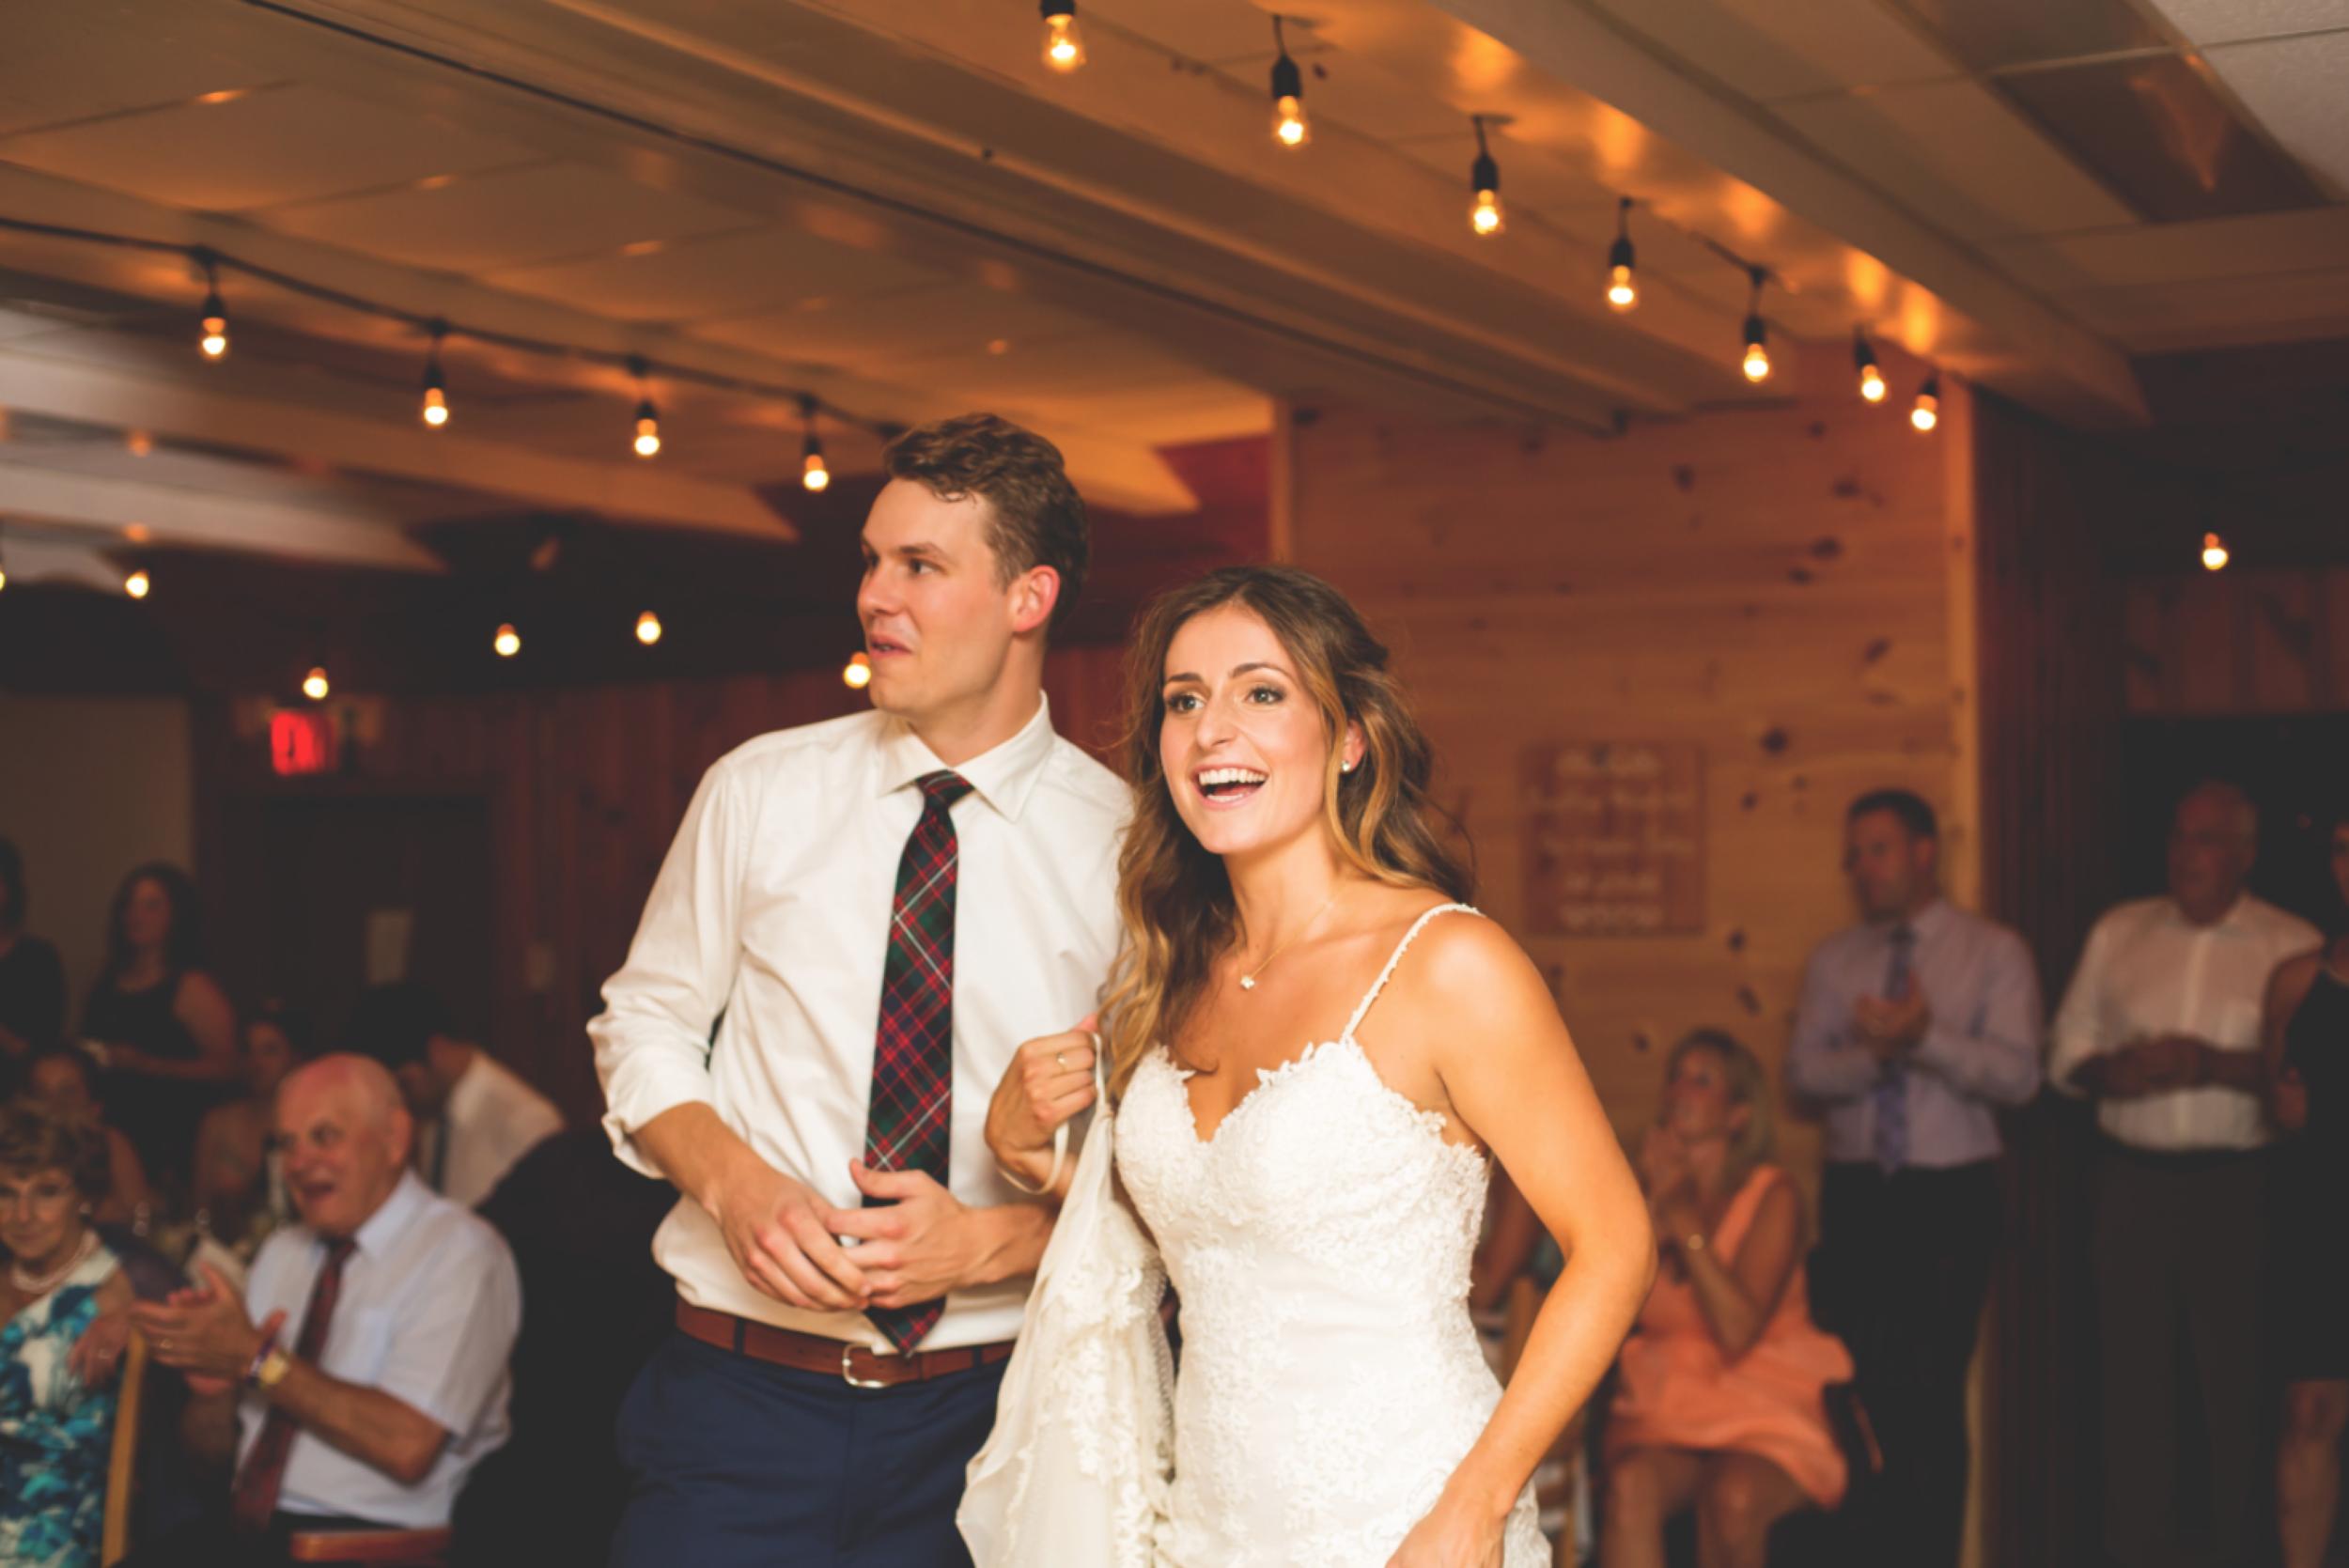 Wedding-Photos-Muskoka-Clevelands-House-Photographer-Wedding-Hamilton-GTA-Niagara-Oakville-Moments-by-Lauren-Photography-Photo-Image-106.png